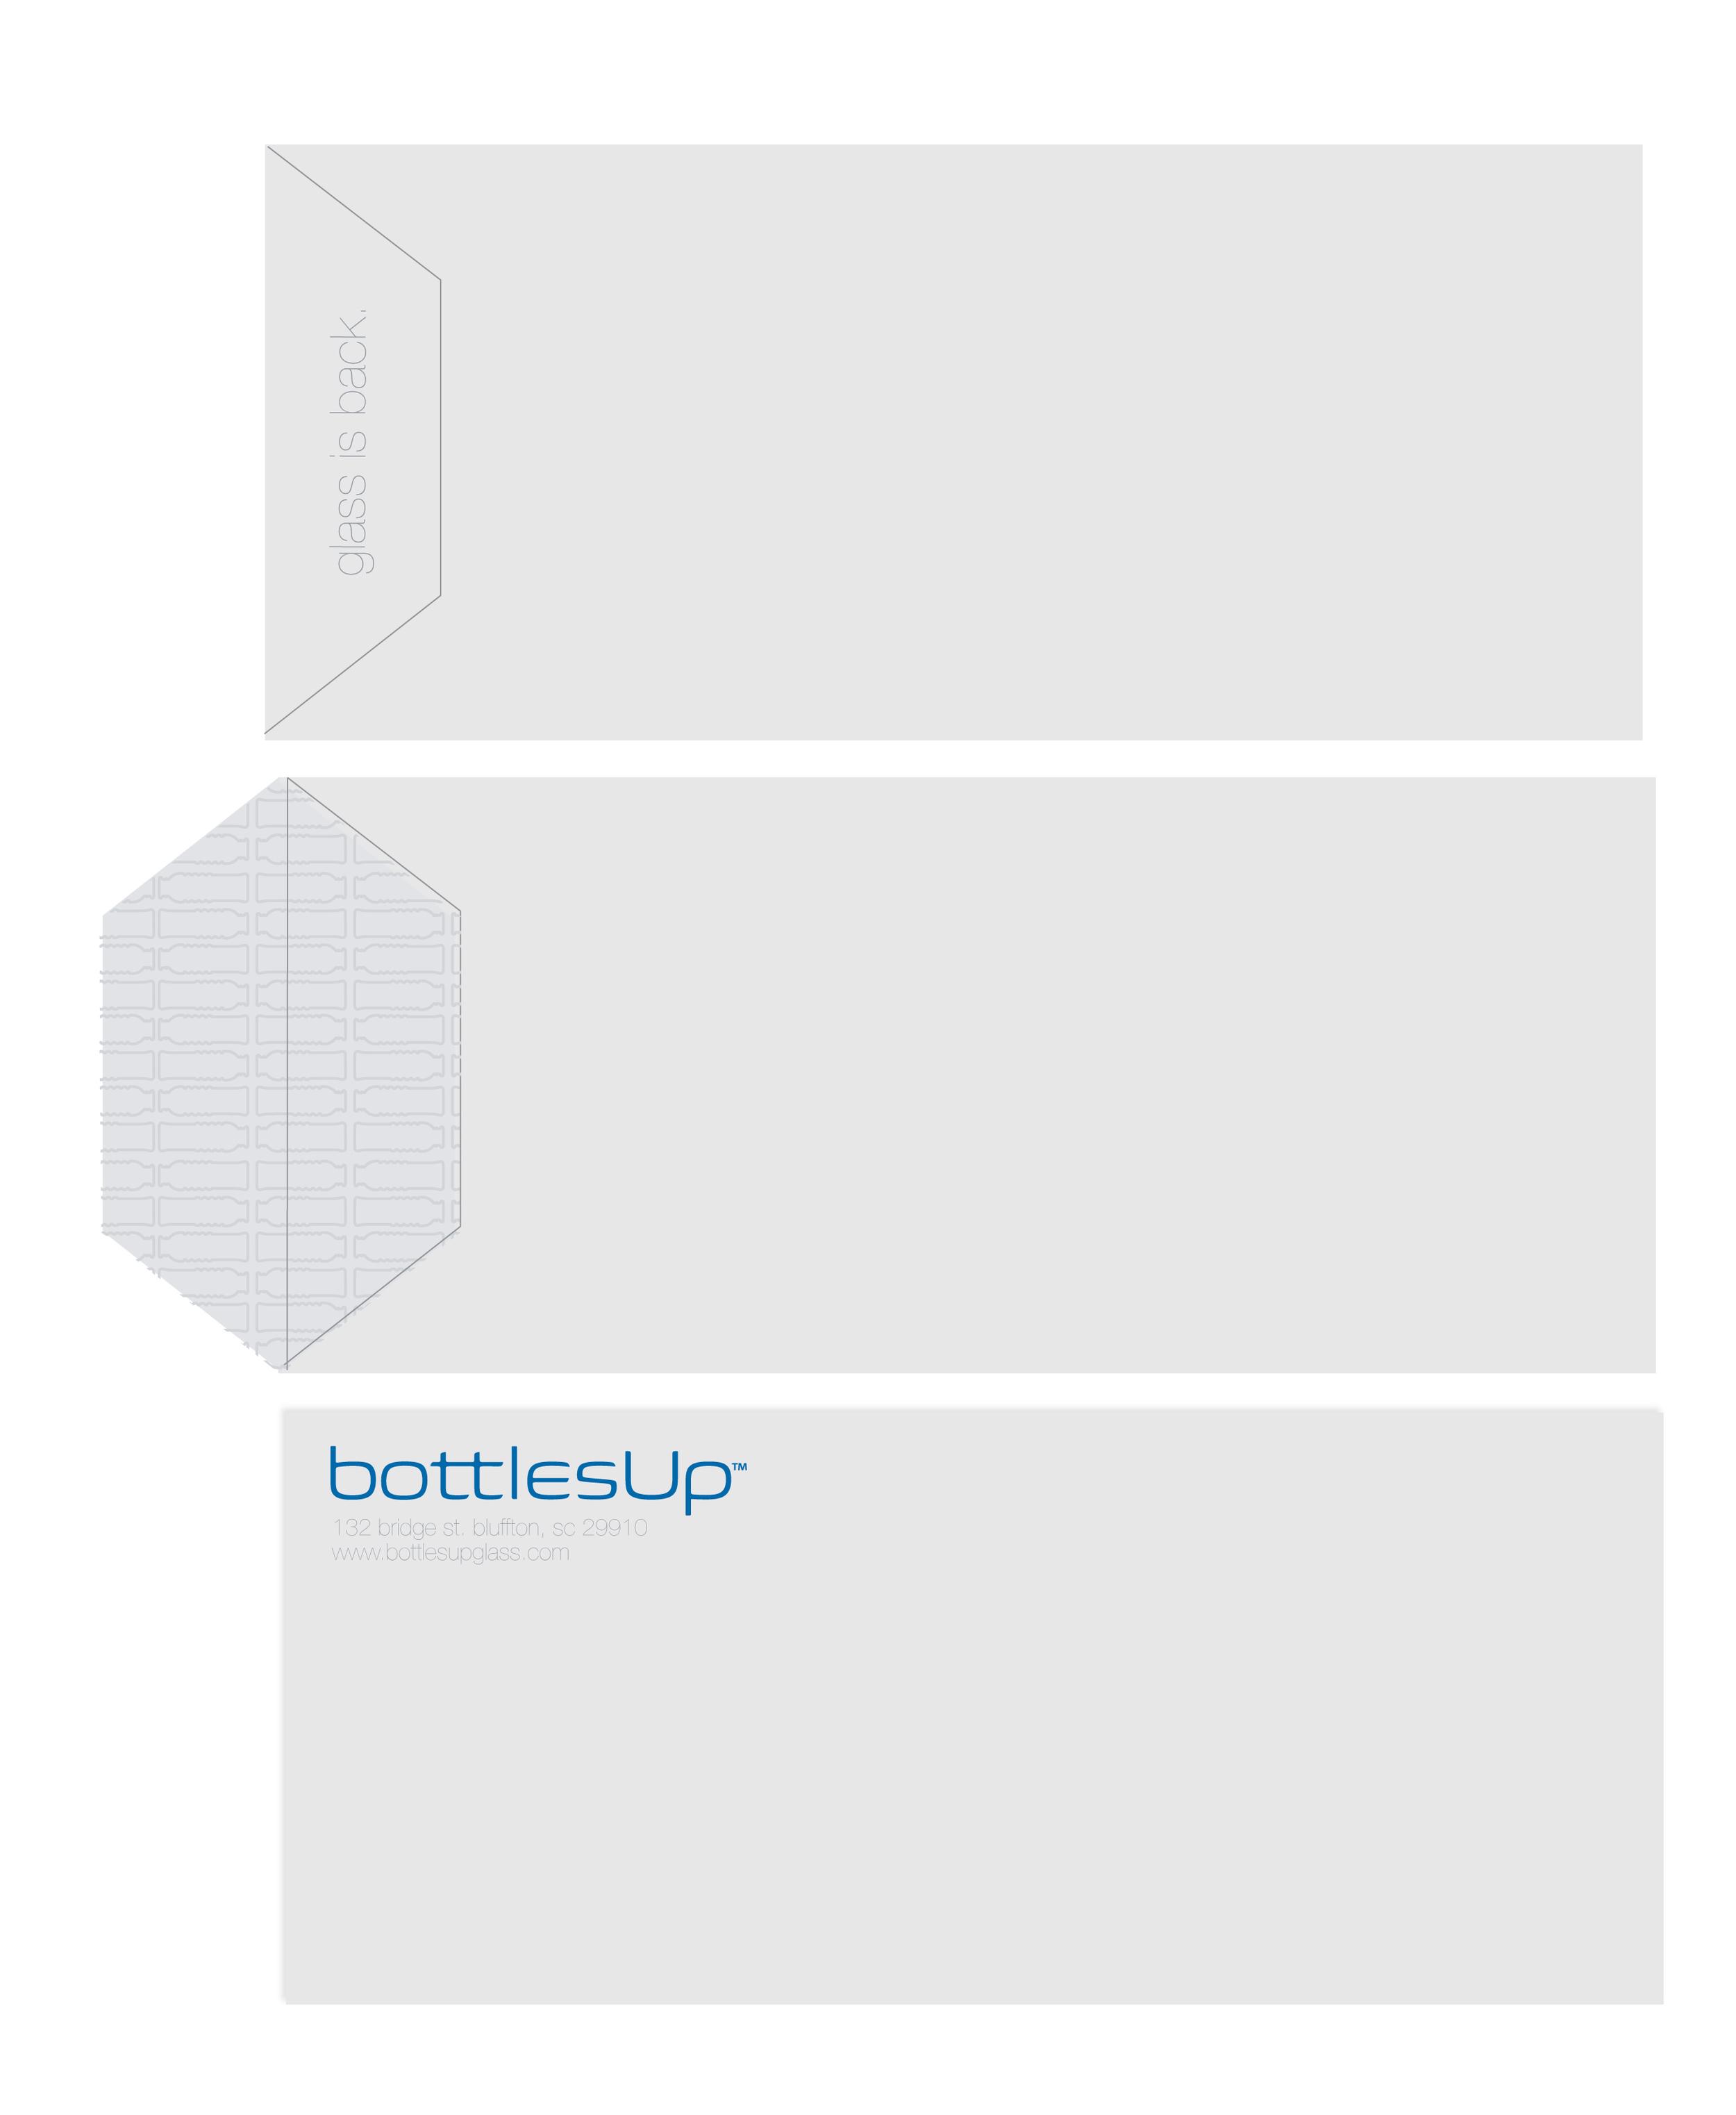 BottlesUp-CorporateIdentity-envelope.jpg